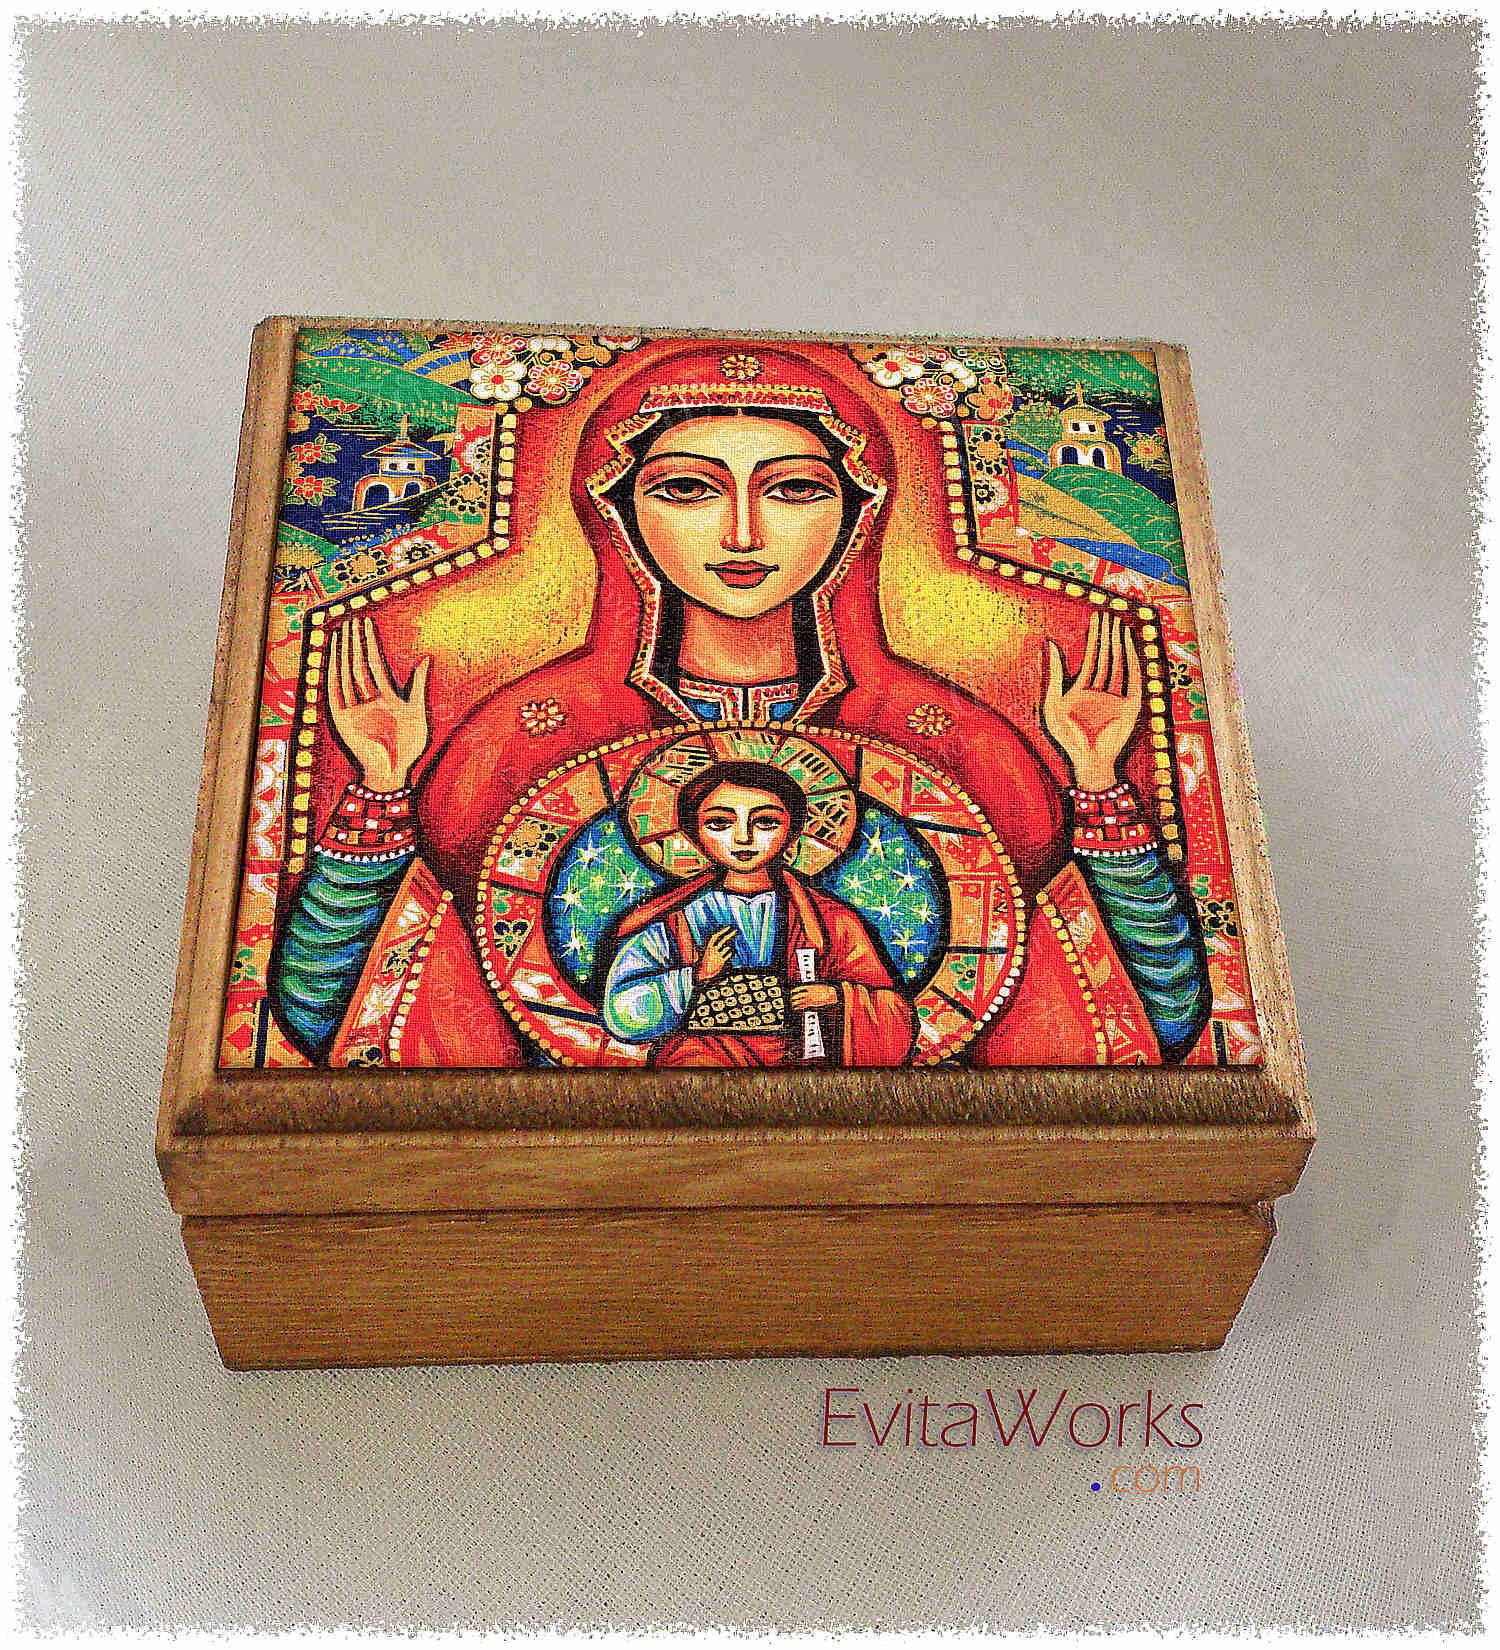 Mother Child 13 Boxsq ~ EvitaWorks